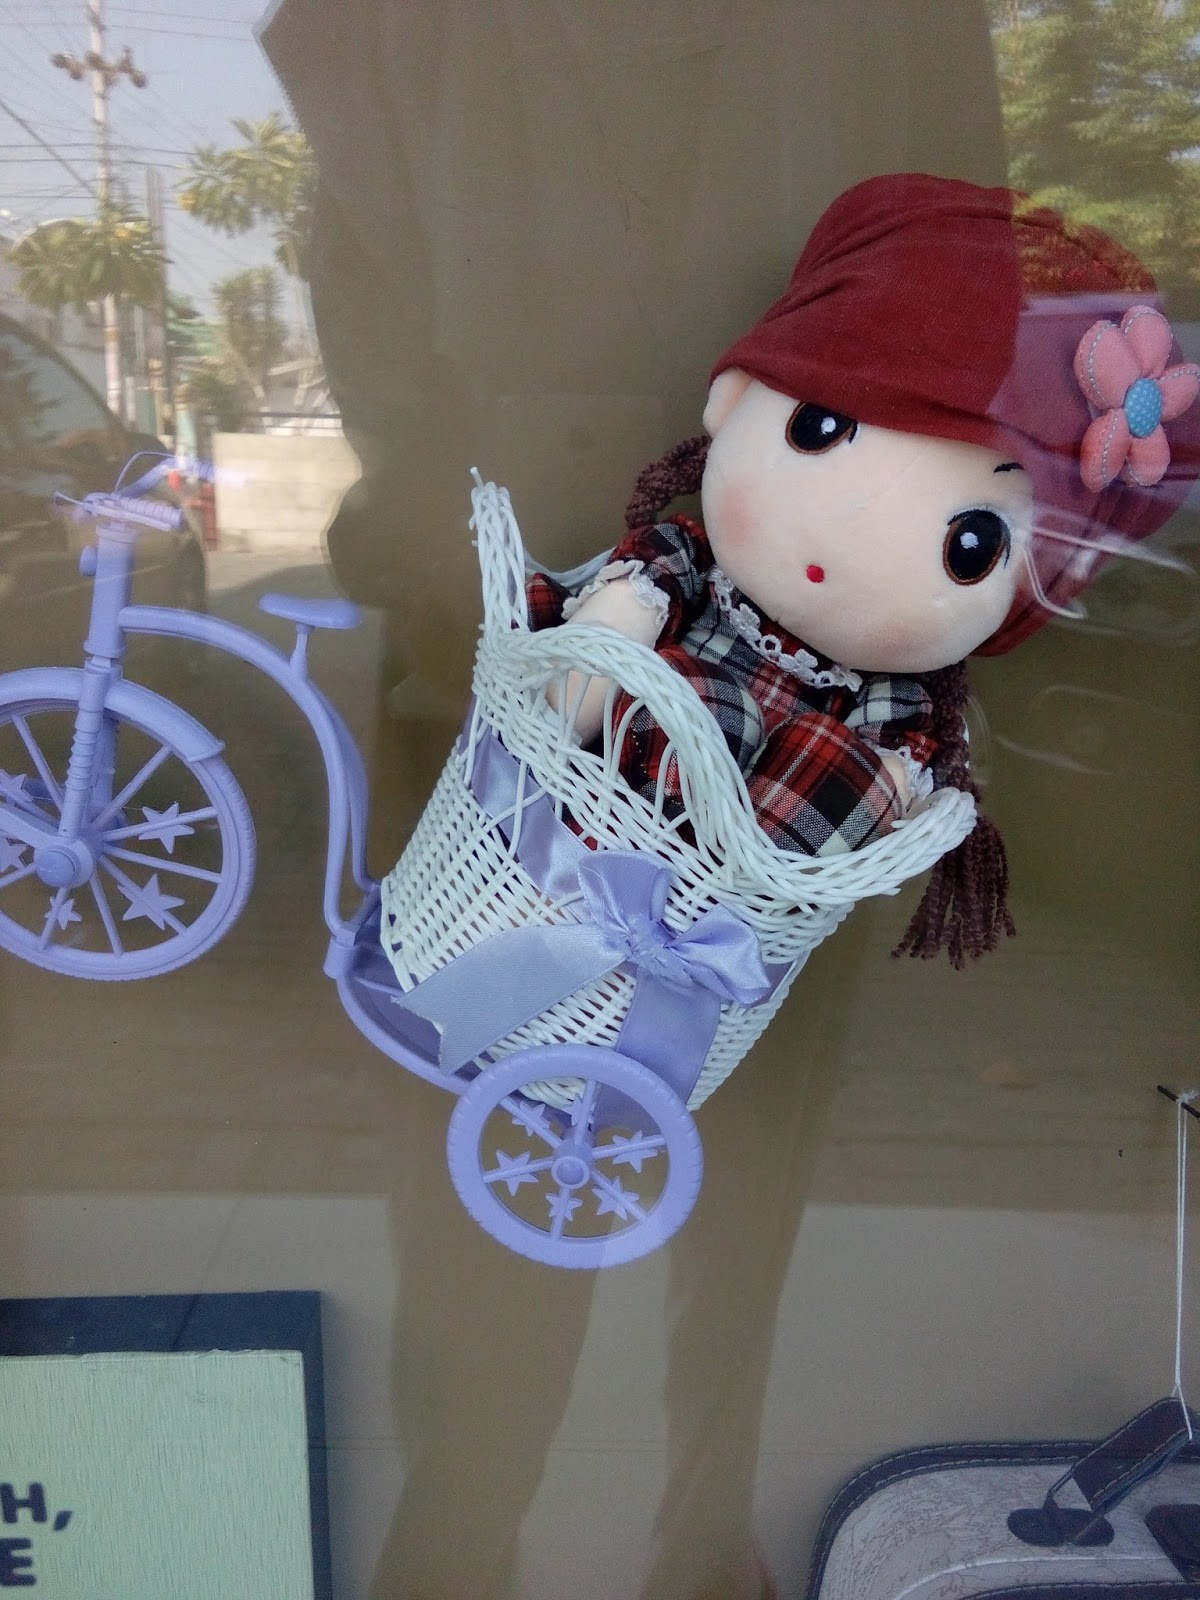 boneka cantik produk yang dijual di Jolie Jogja Wirobrajan